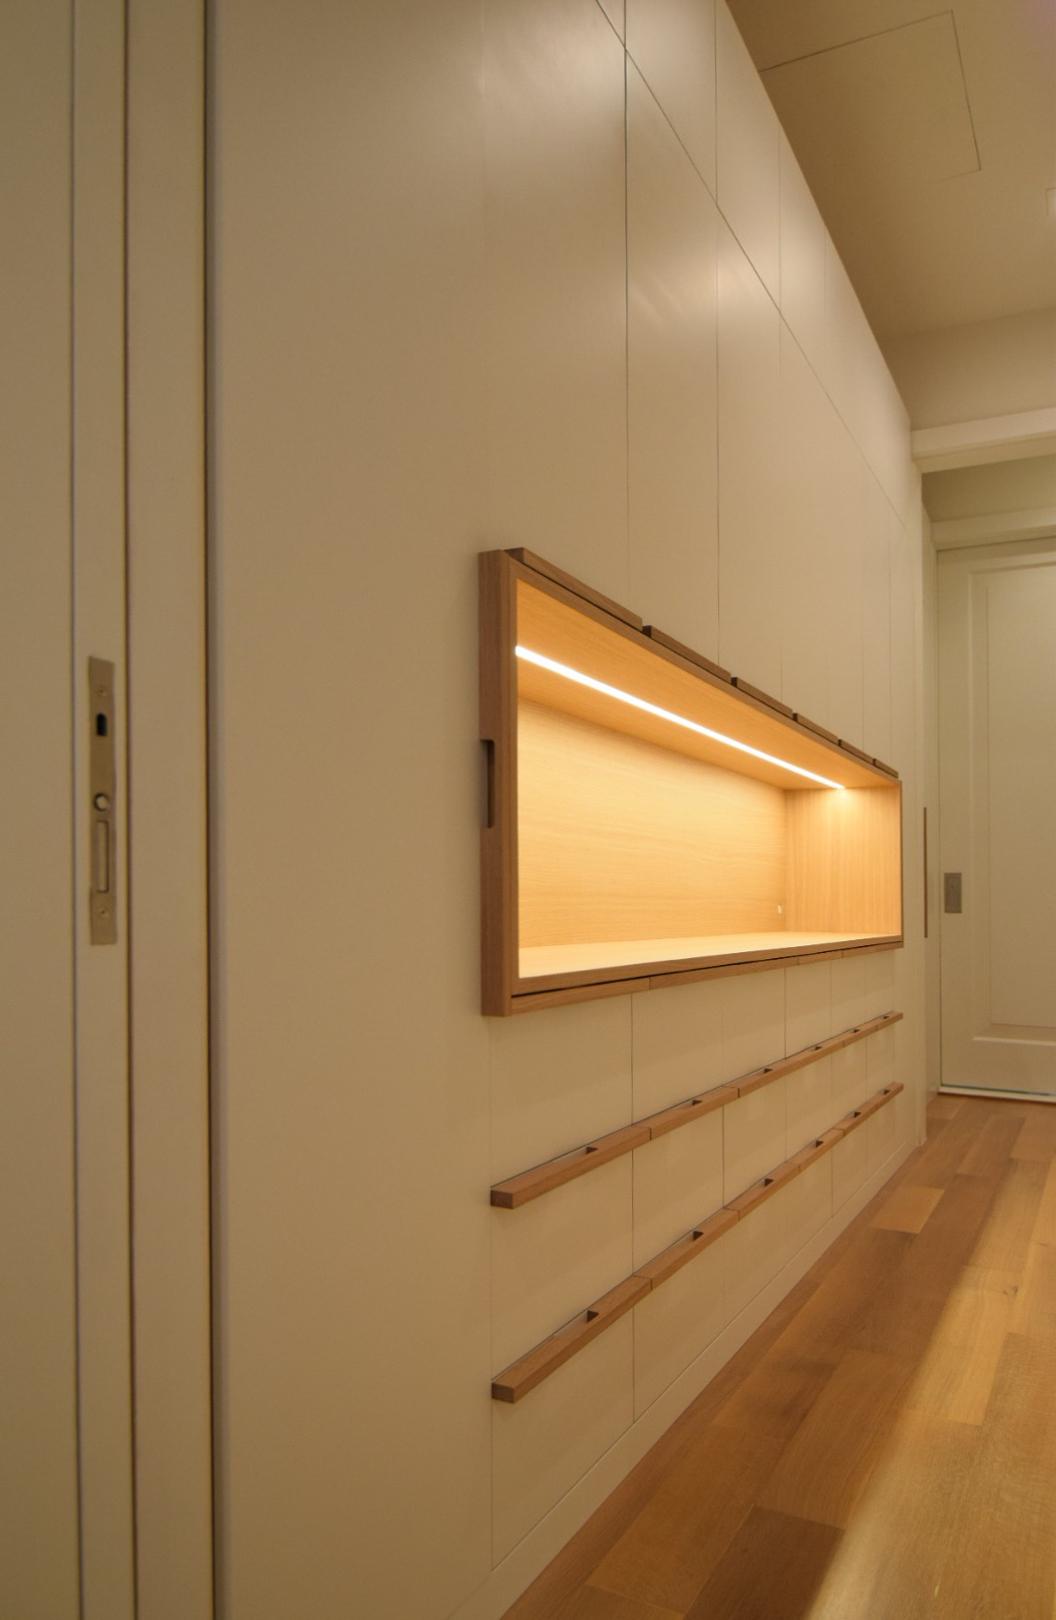 custom-walk-in-closet-drawers-white-lacquer-finish-maple-interior-white-oak-handles-and-white-oak-accent-open-cabinet.jpg